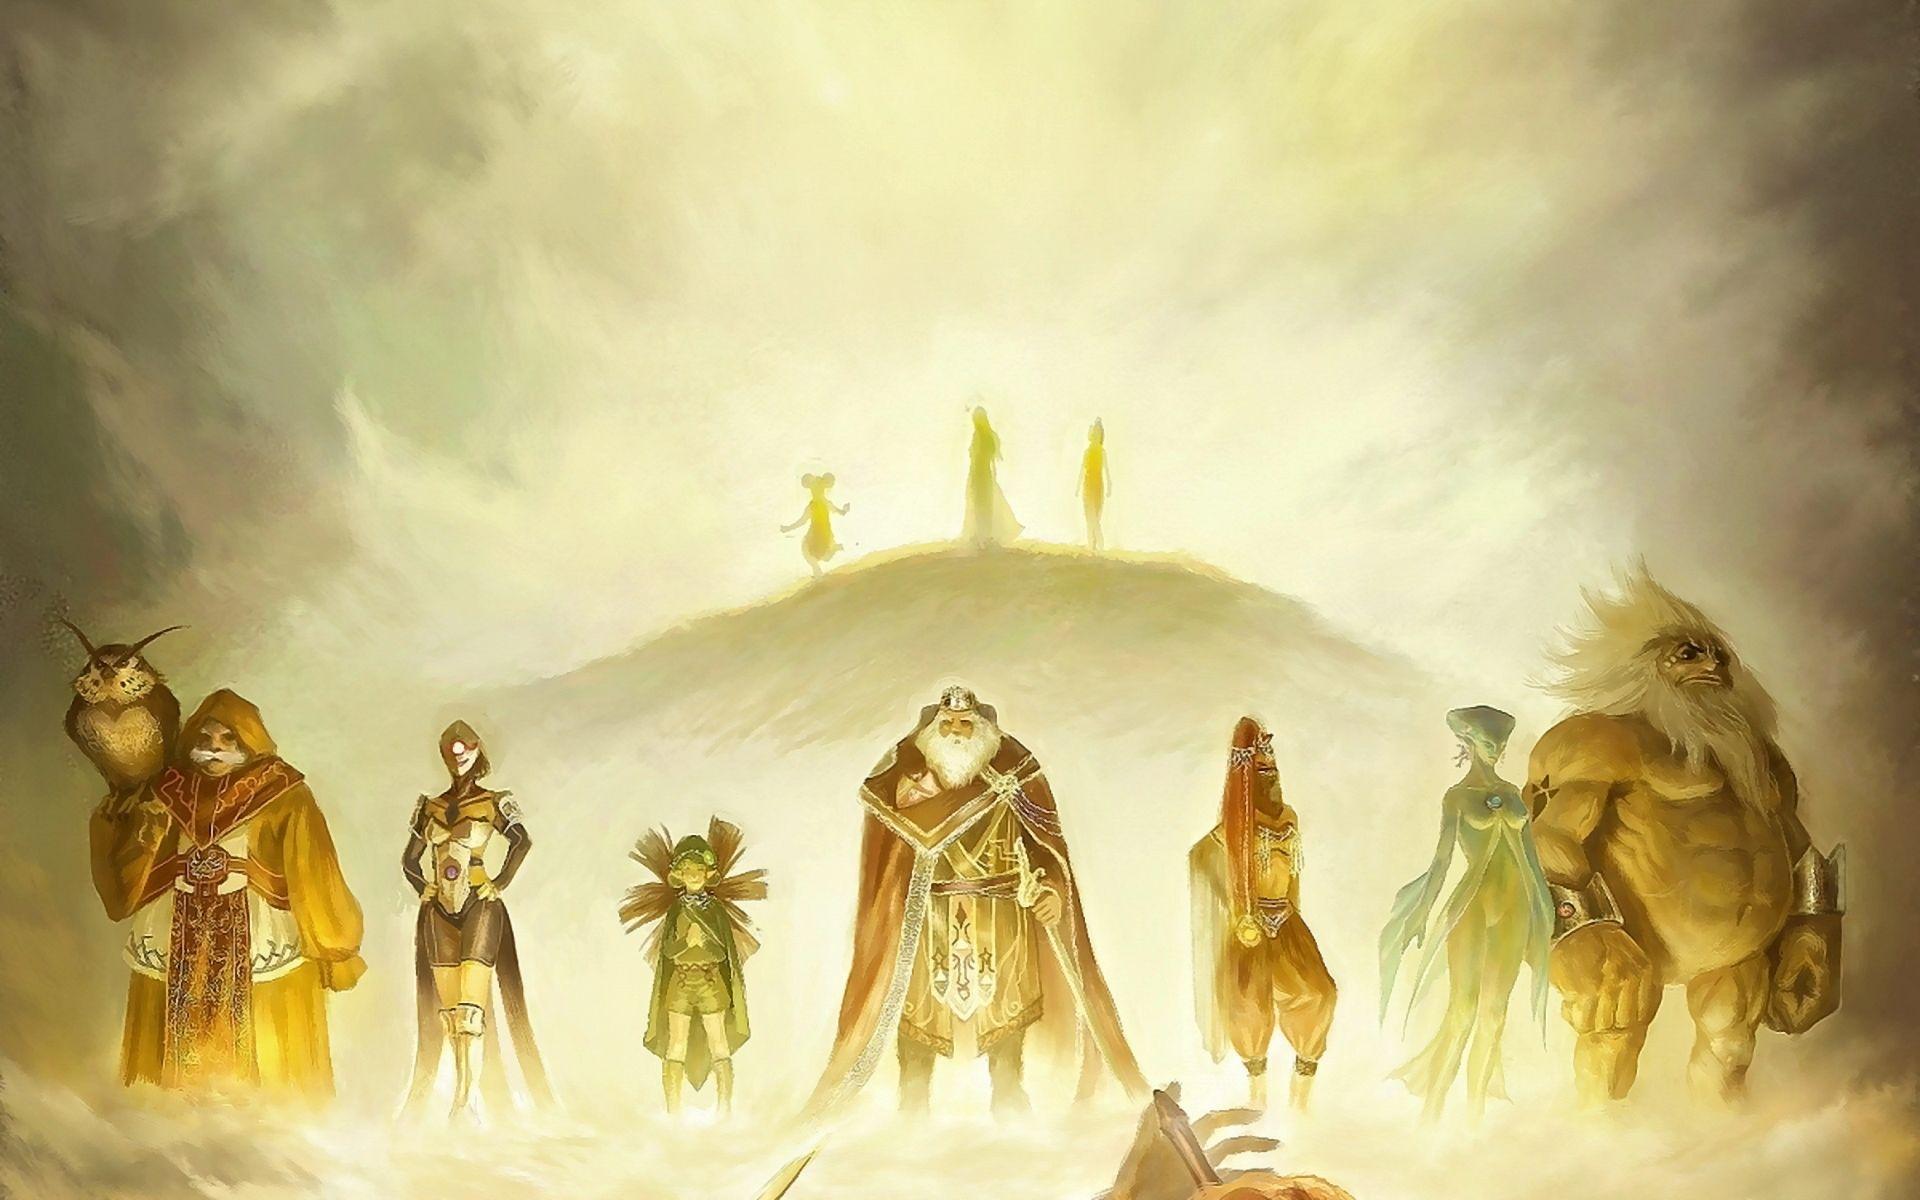 Legend of Zelda : Deku Tree by Minionslayer on DeviantArt